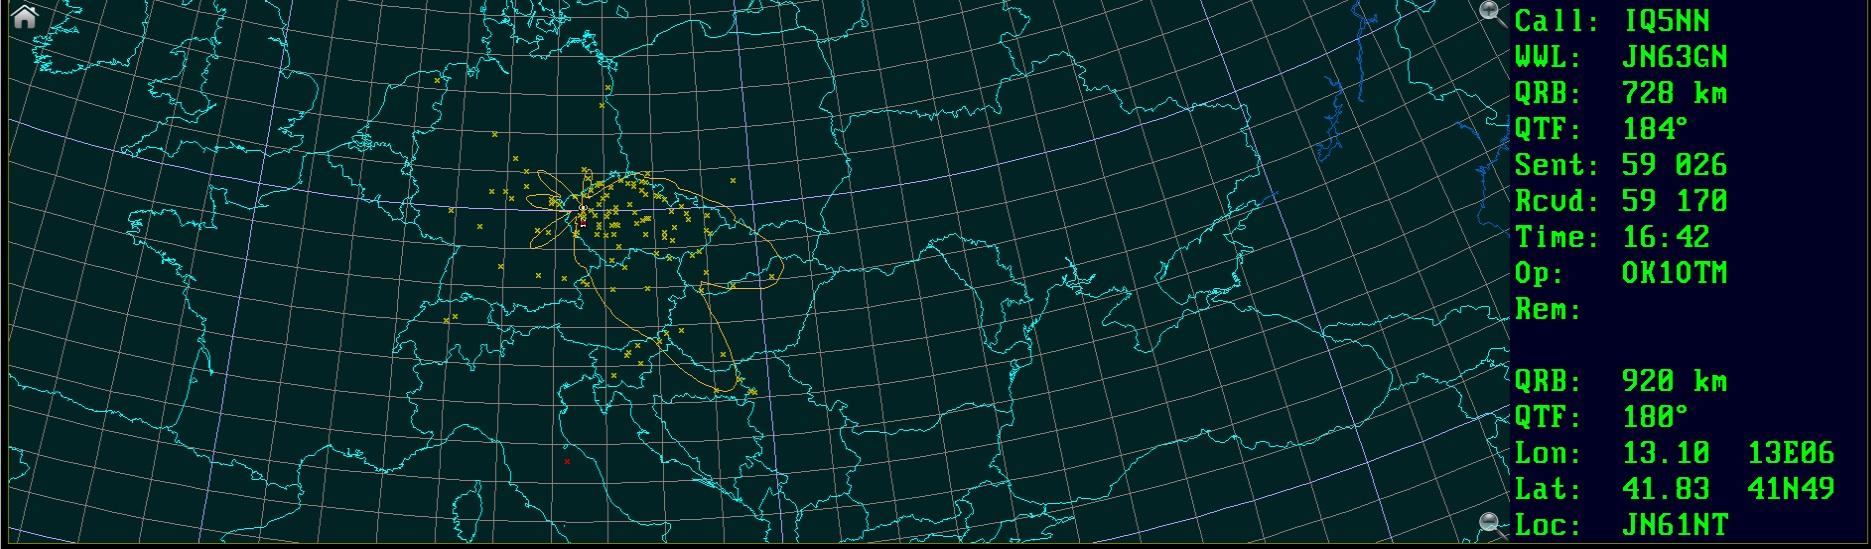 Mapa spojeni